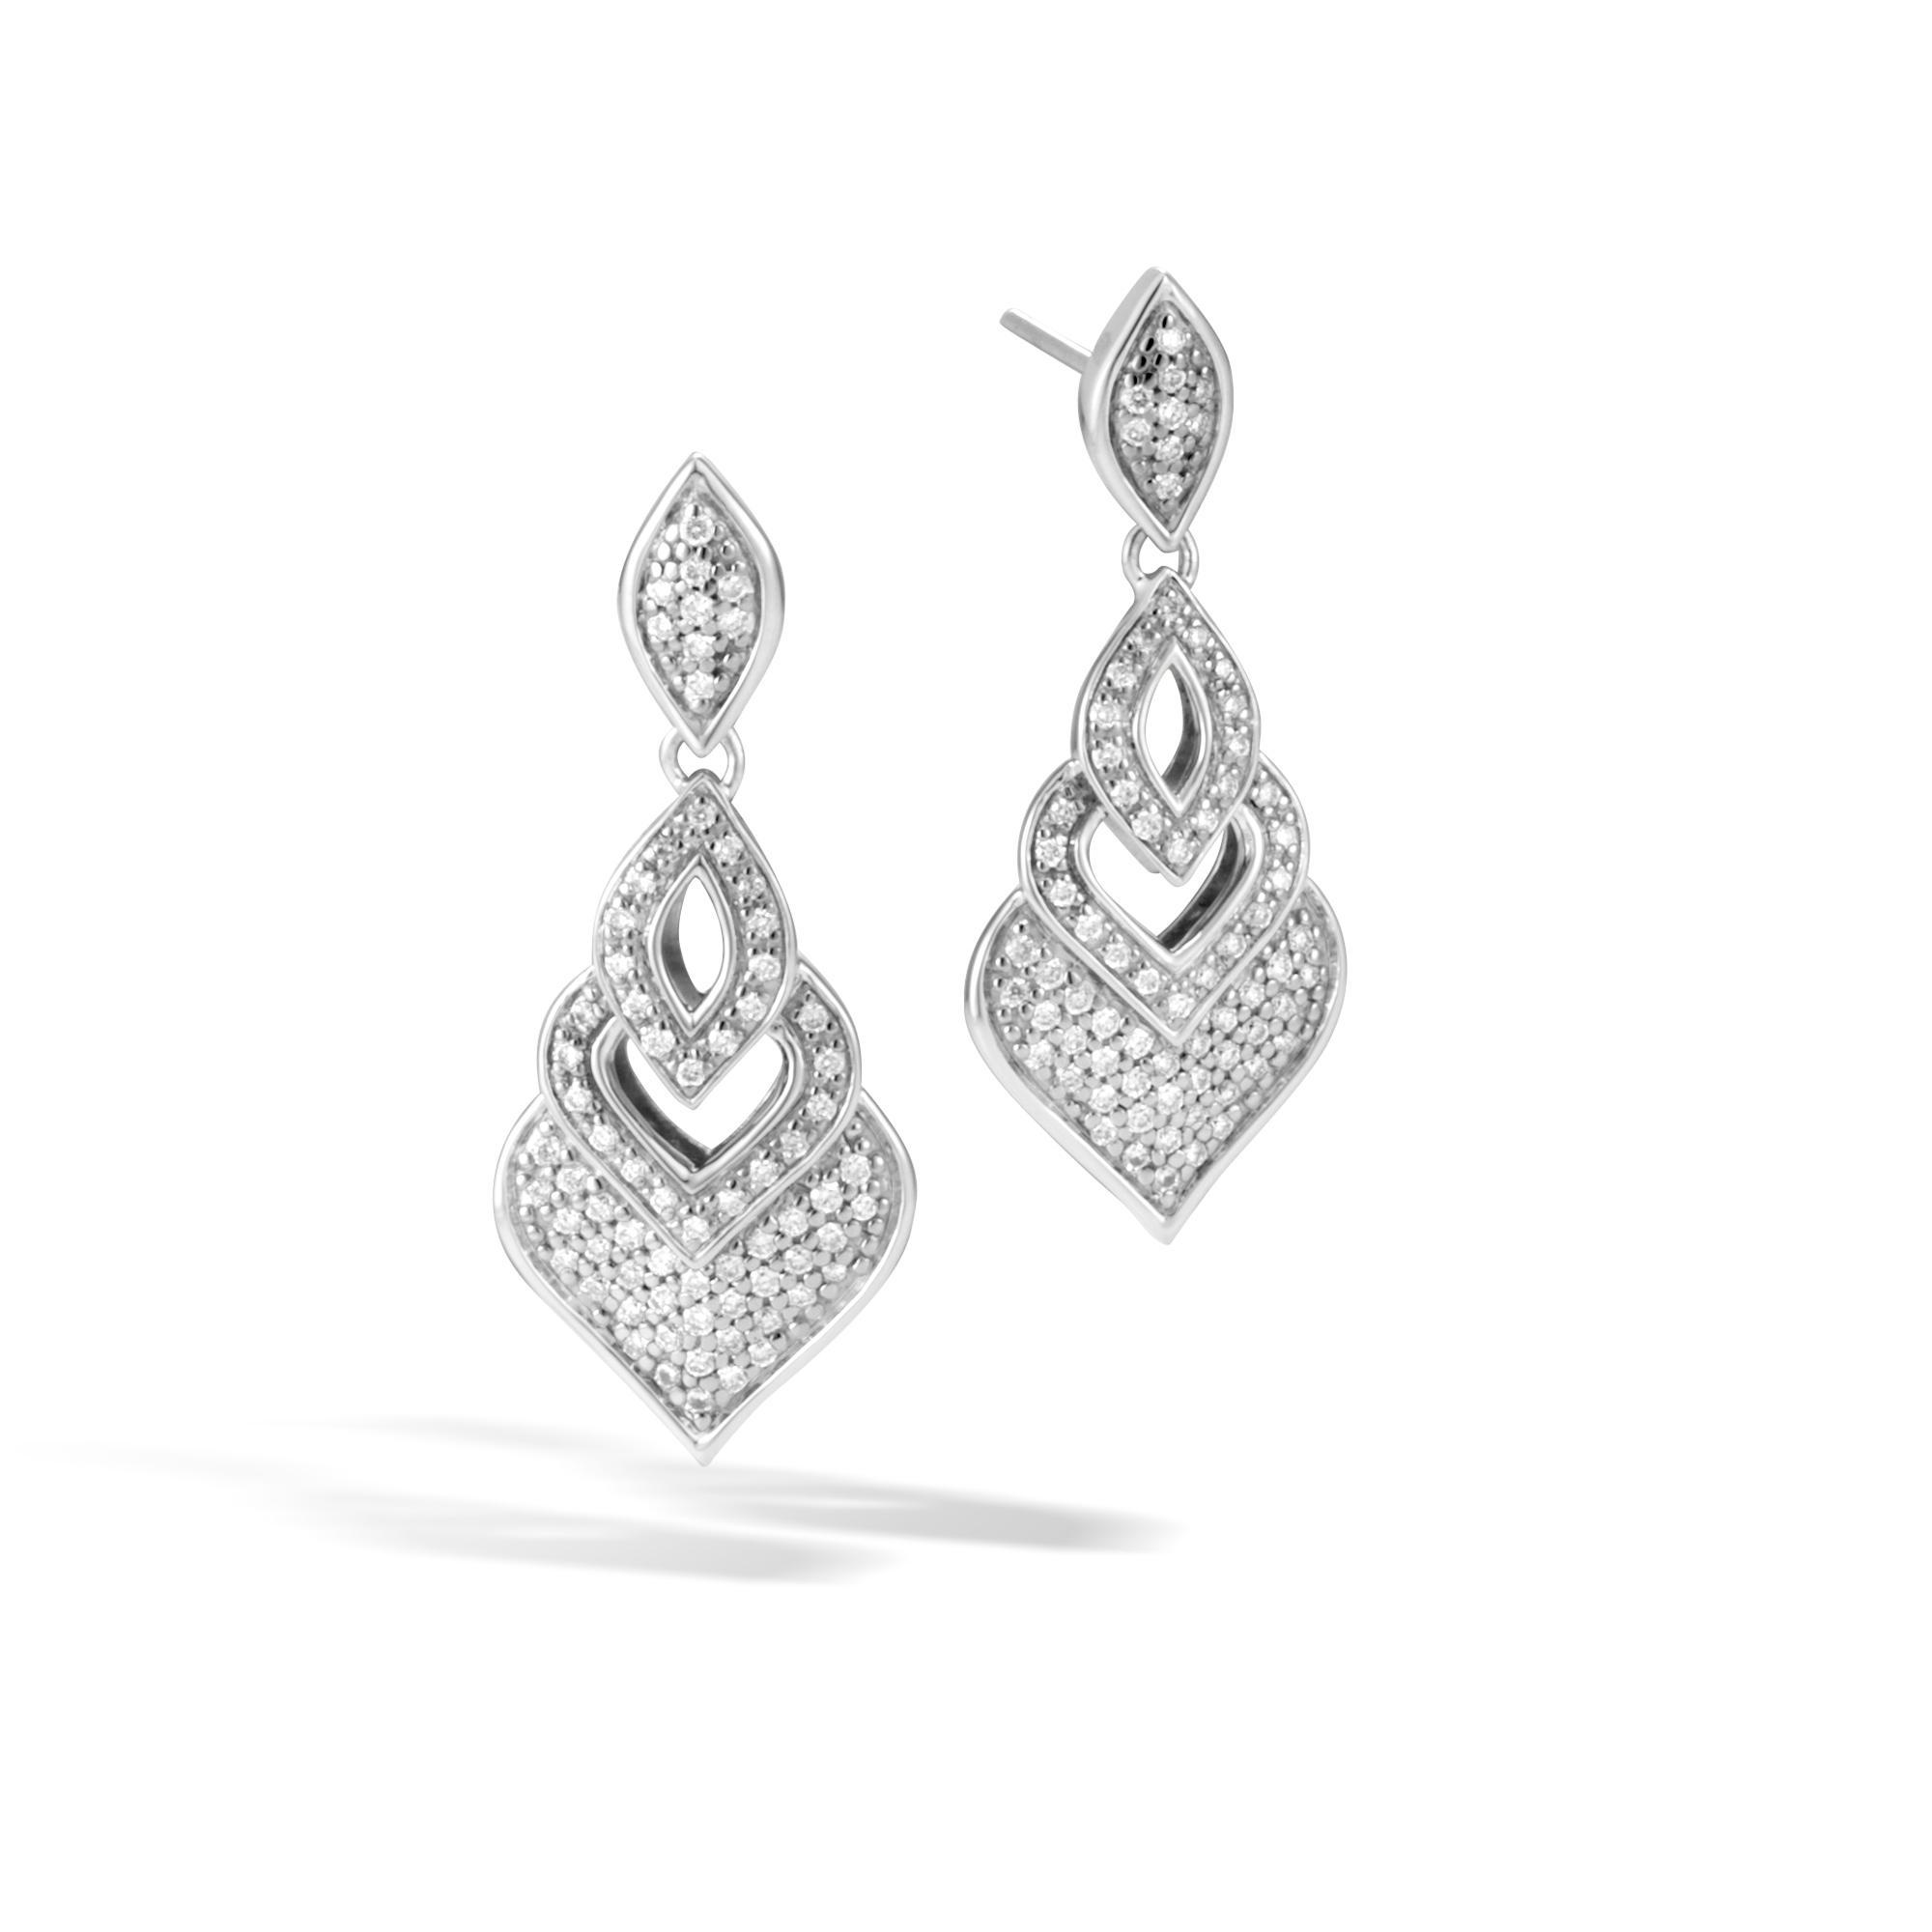 John Hardy Naga Stud Earrings w/ Diamonds mUVot